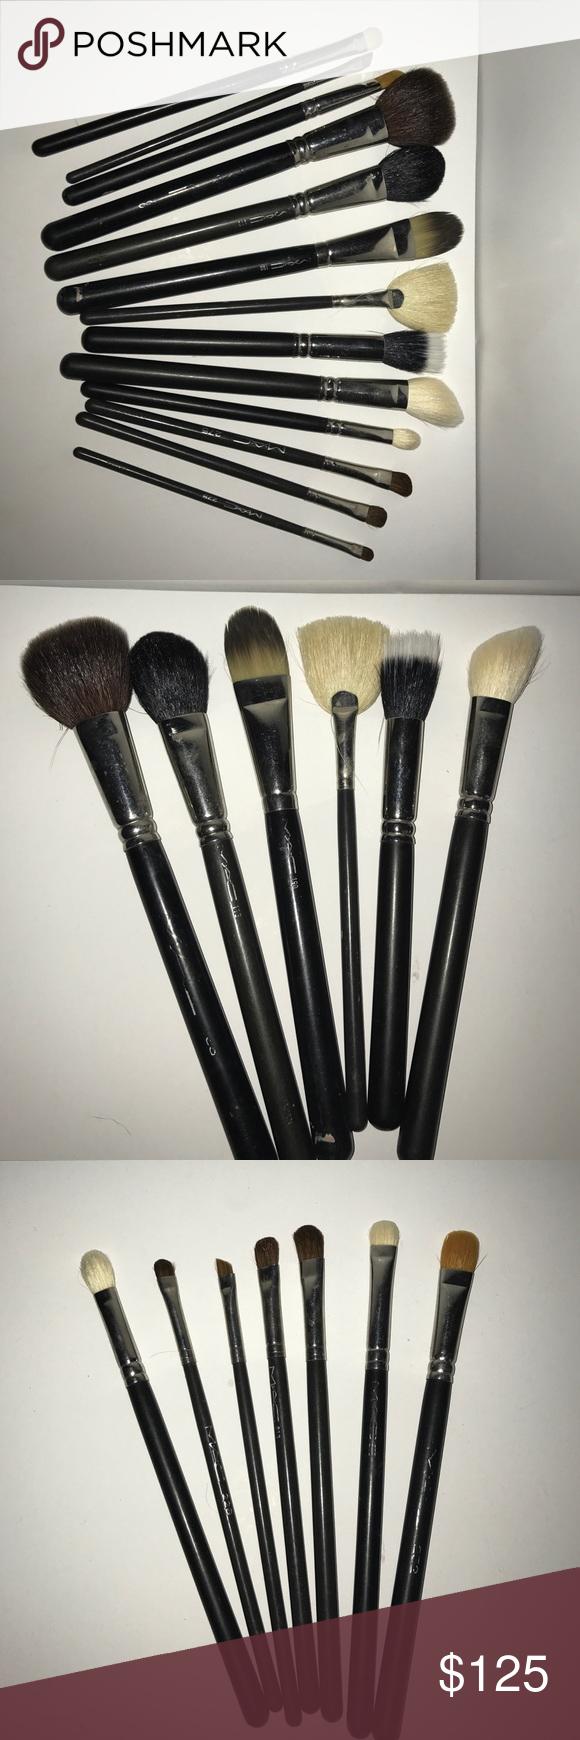 MAC COSMETICS Makeup HAUL w/ Swatches - YouTube